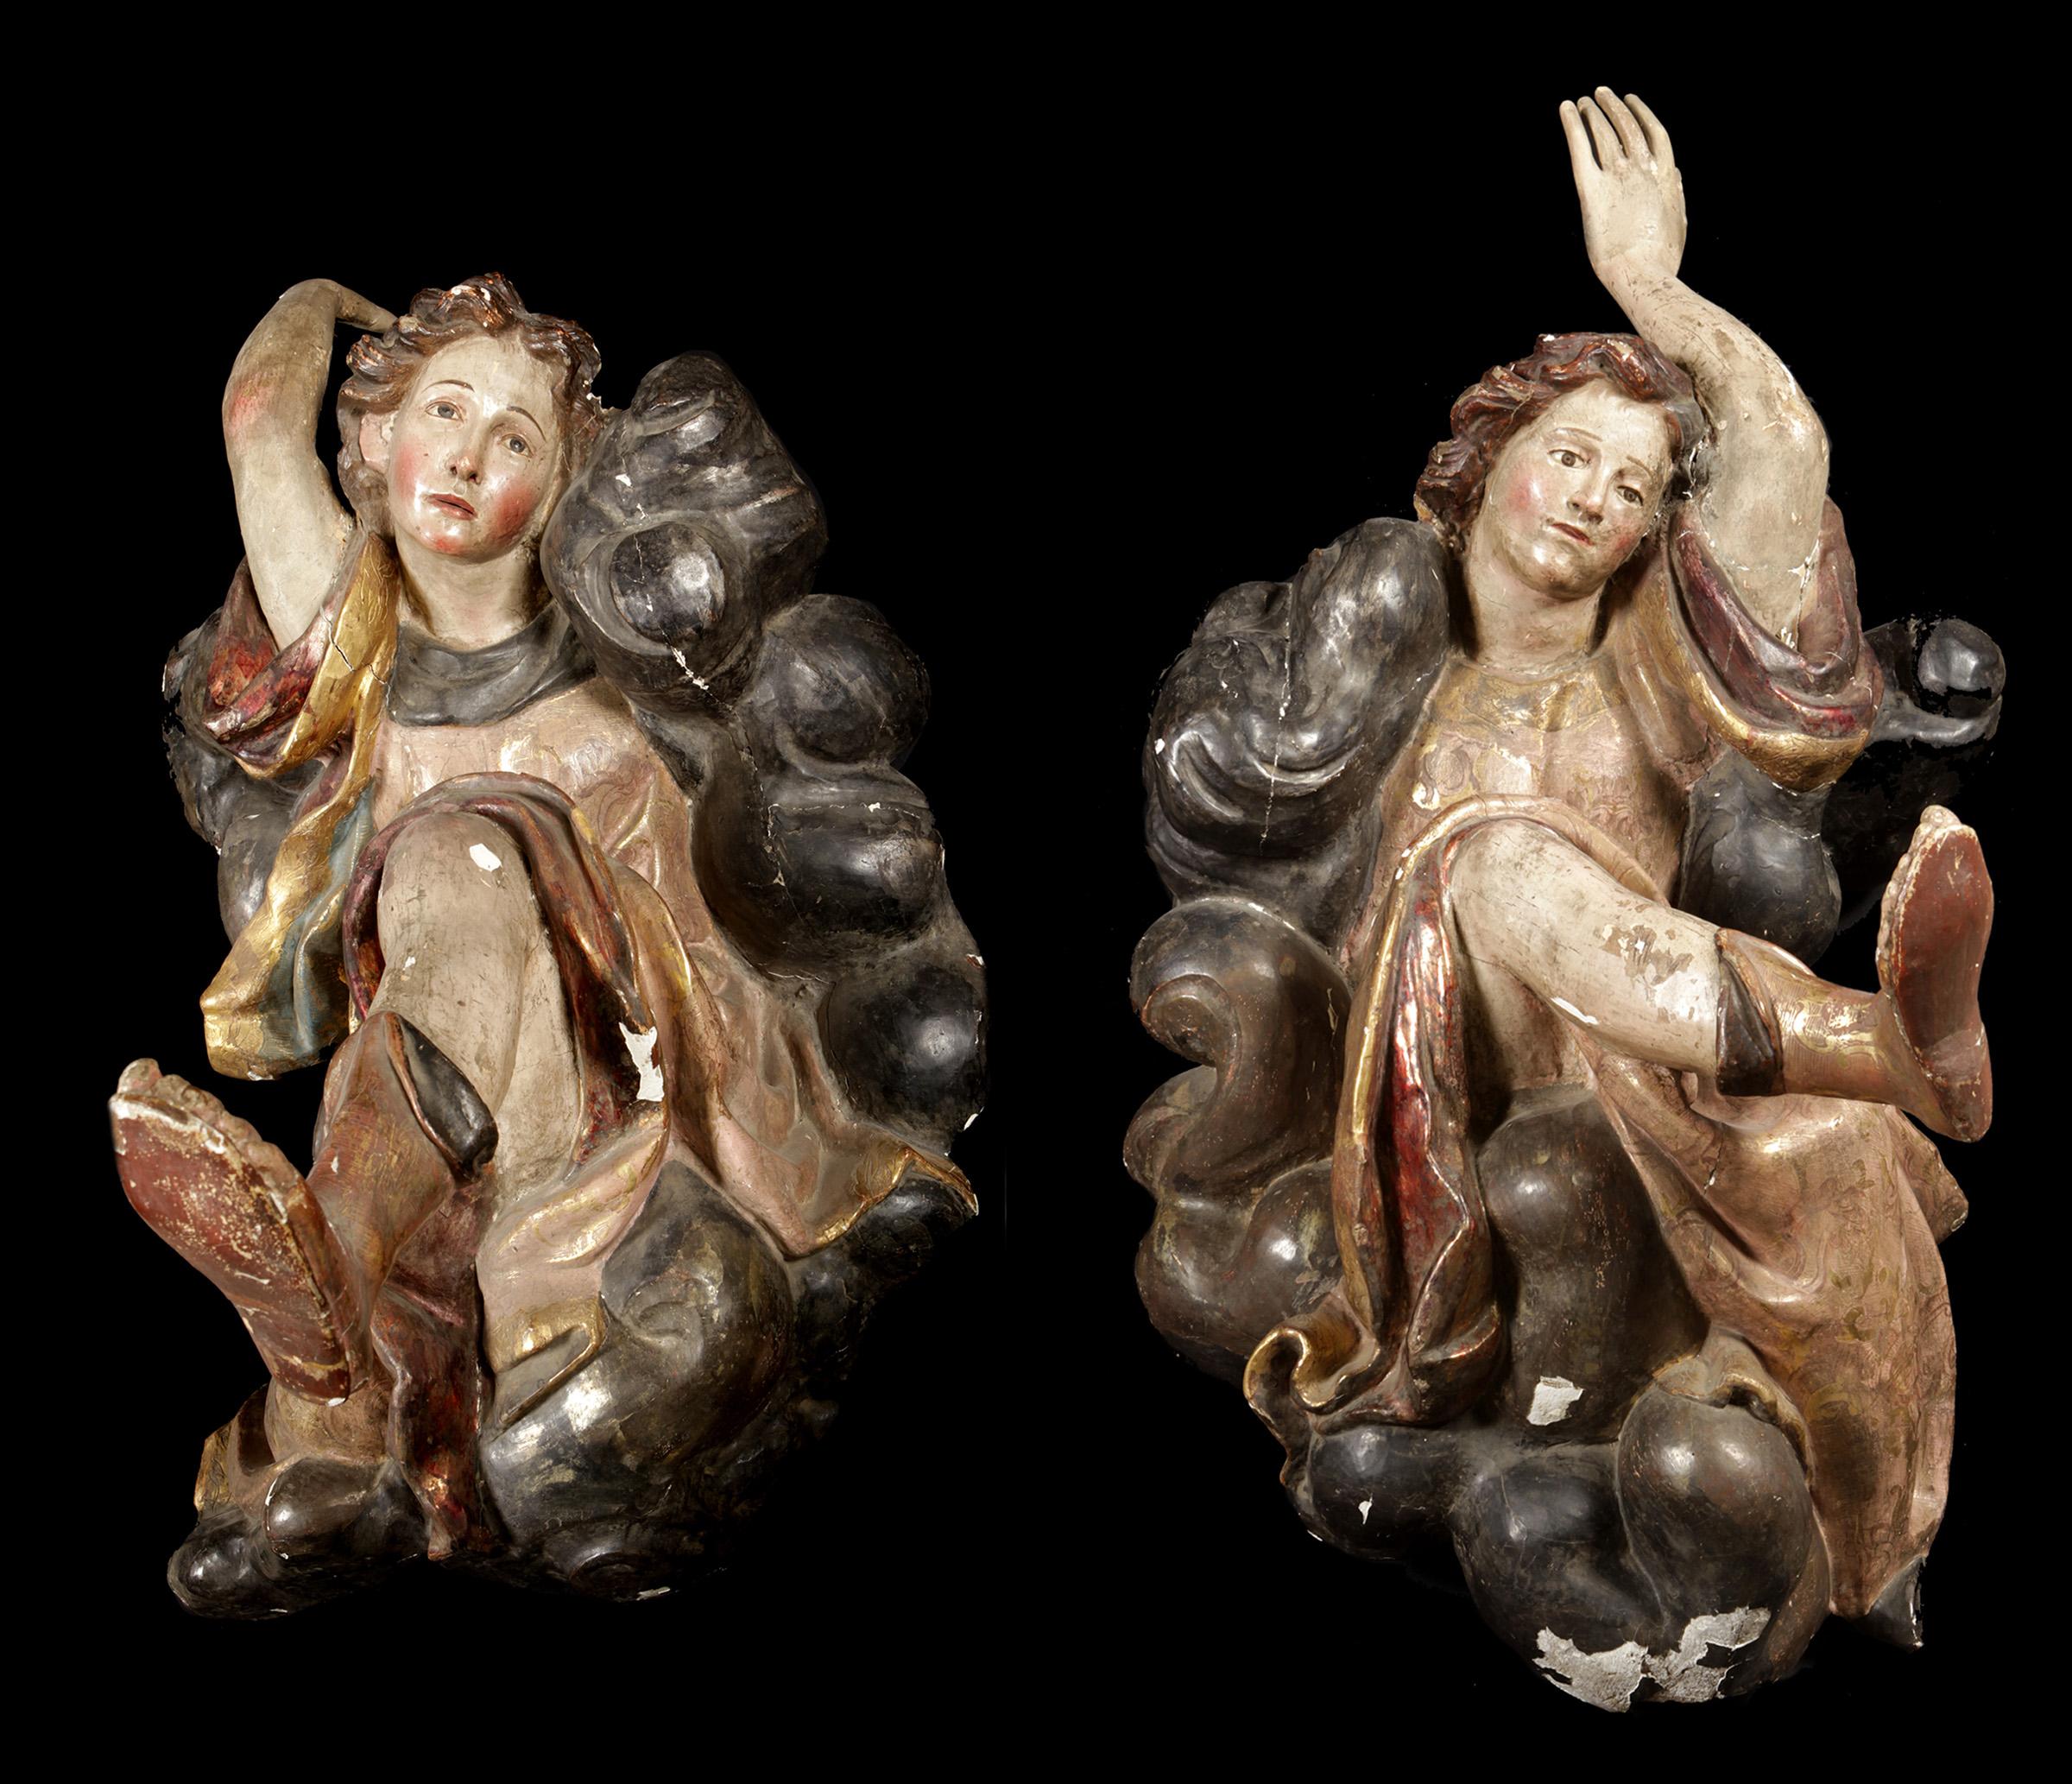 Pareja de ángeles barrocos, siglo XVII.